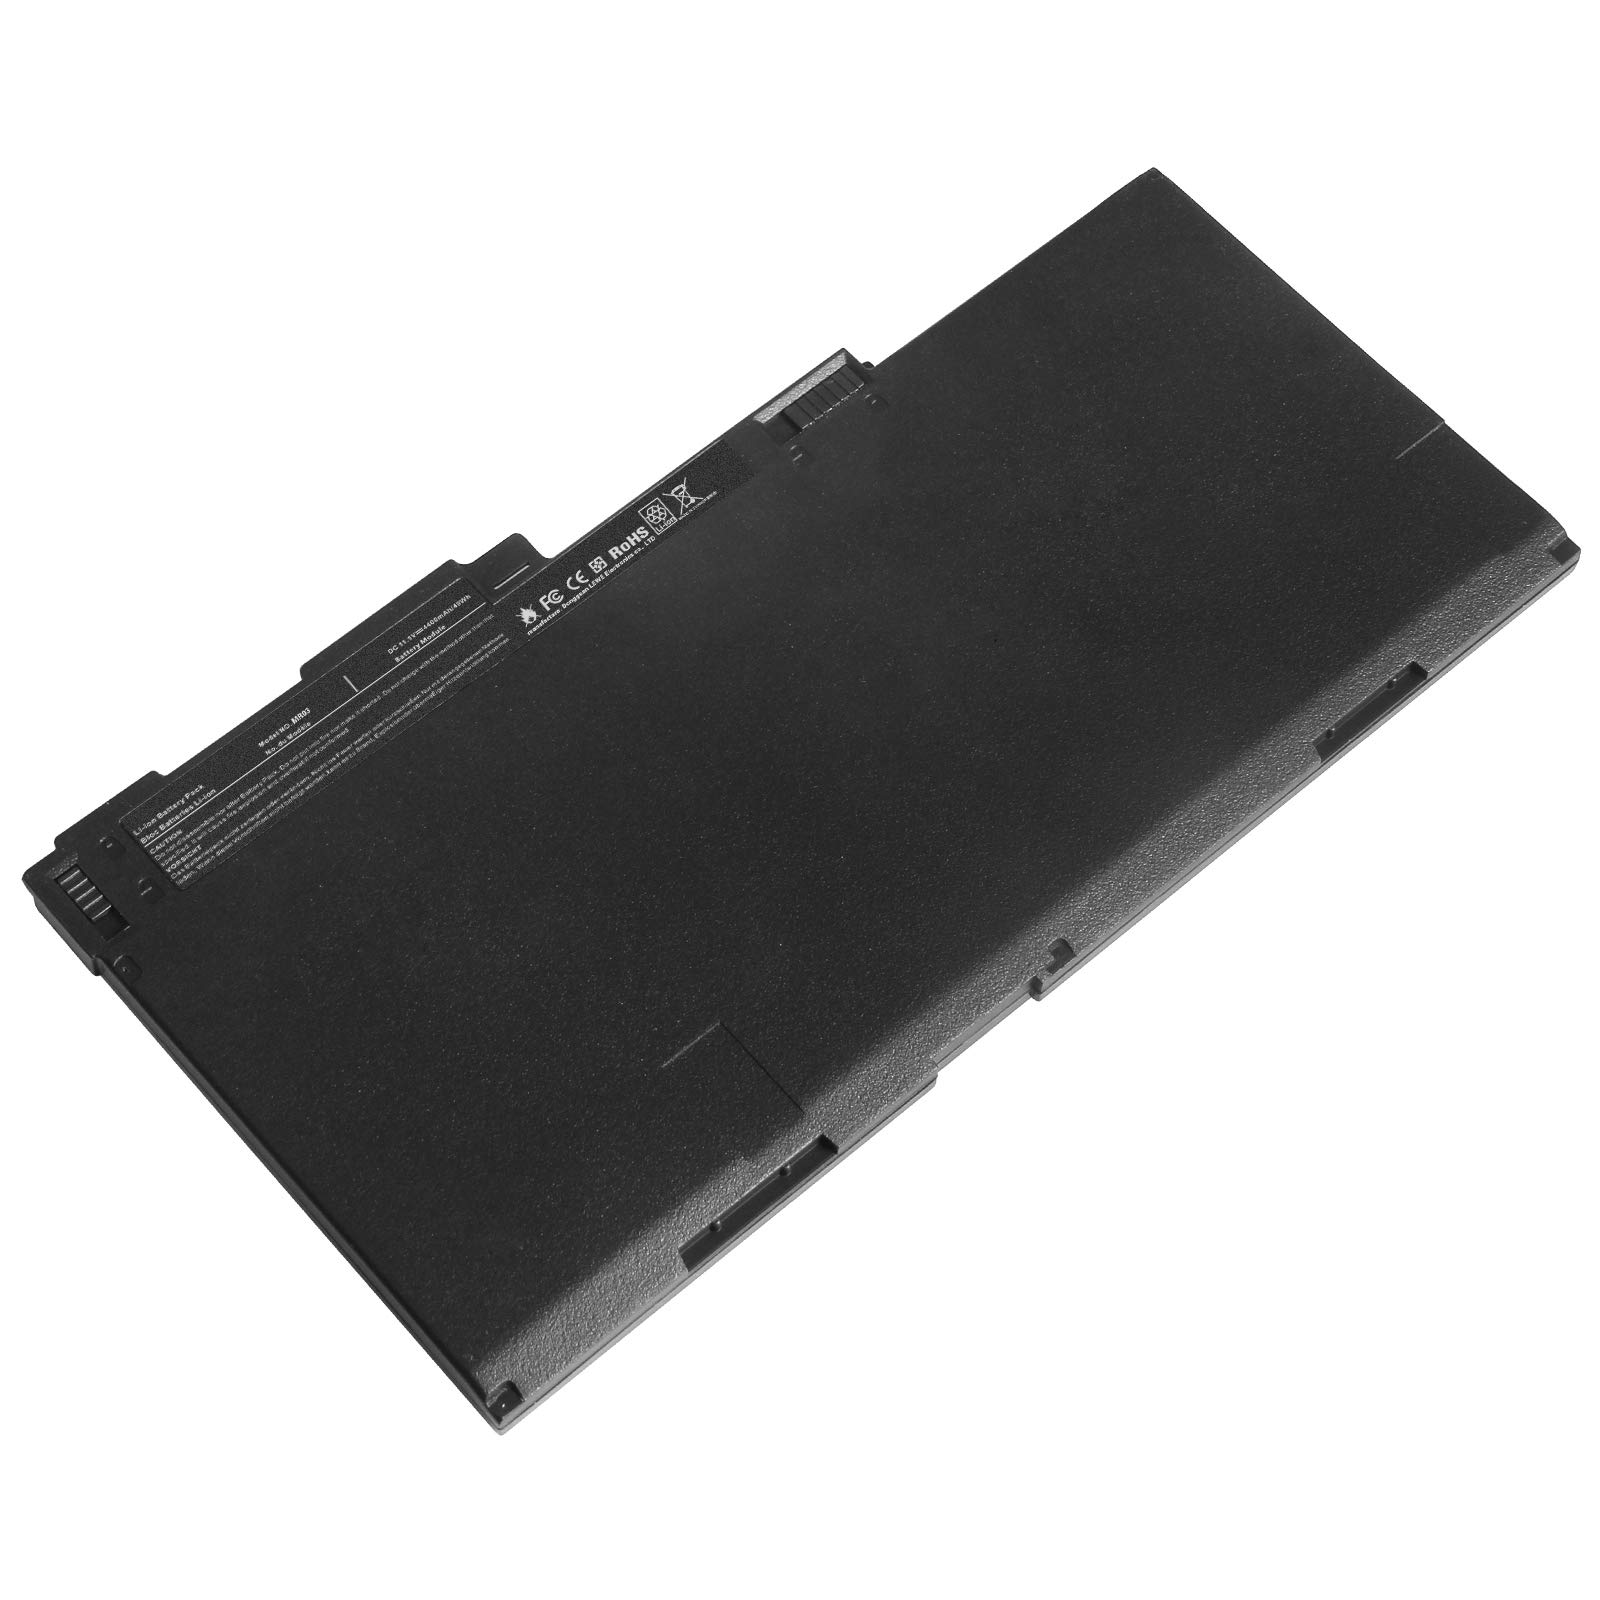 Bateria ACDoctor INC CM03XL HP EliteBook 740 745 750 755 840